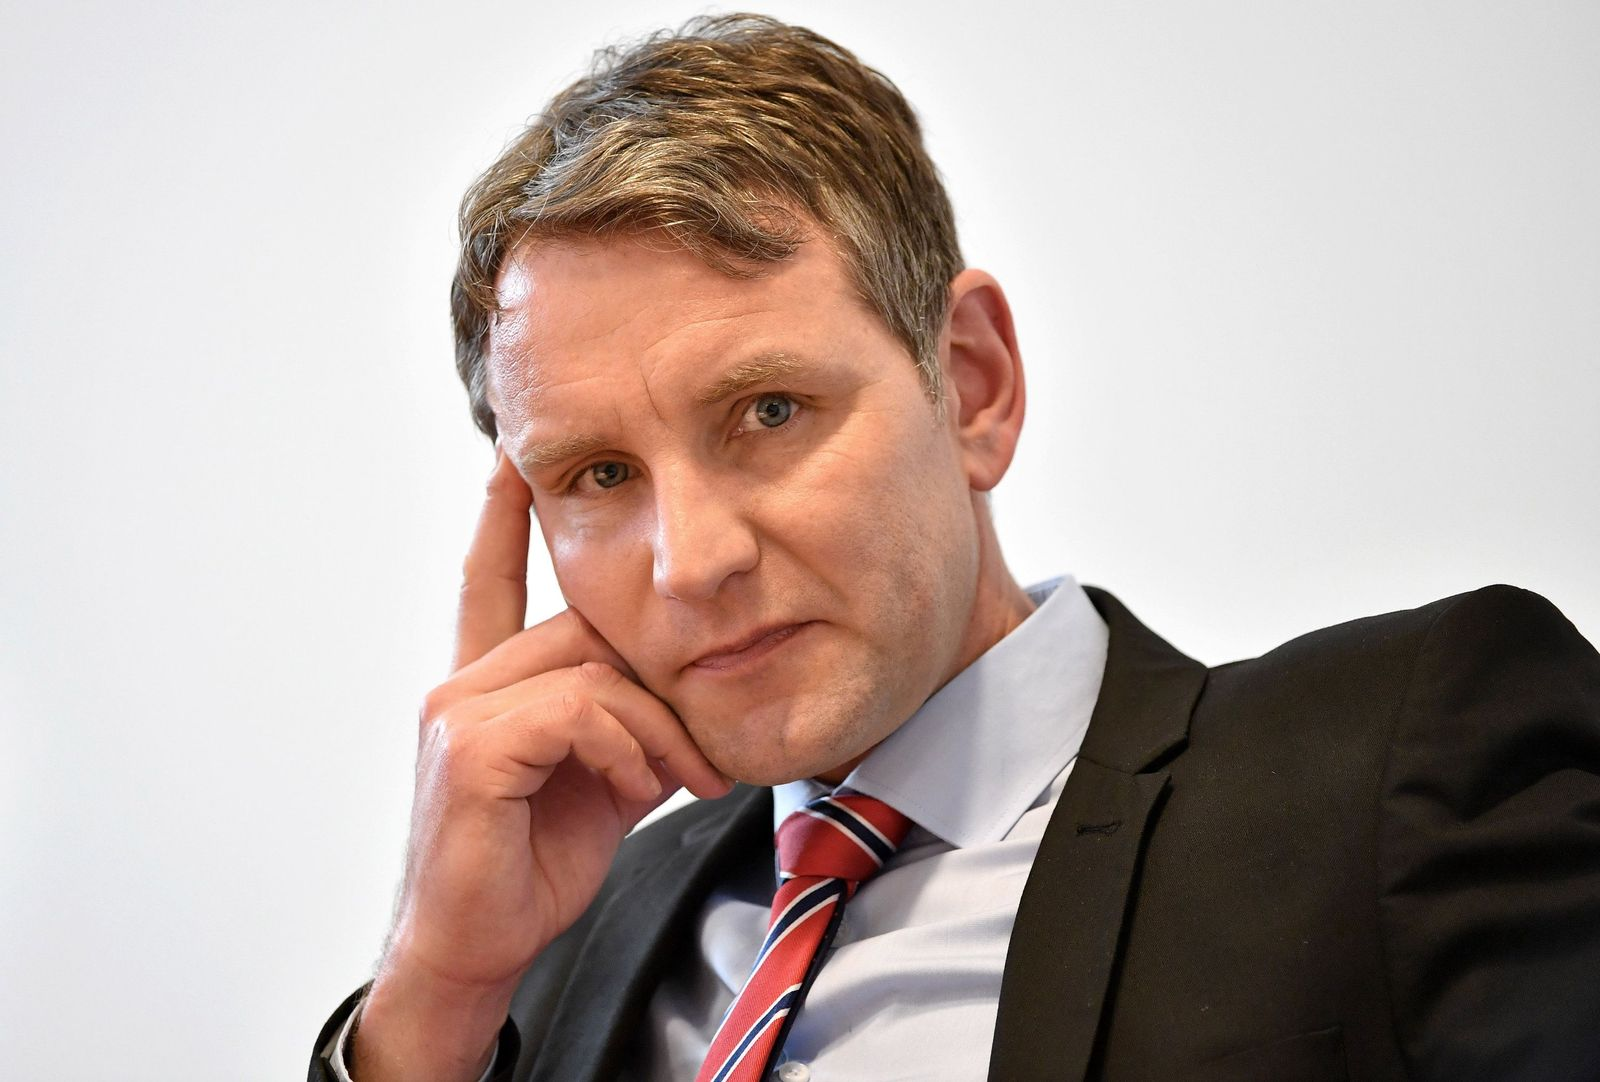 AfD-Bundesvorstand beantragt Parteiausschluss Höckes